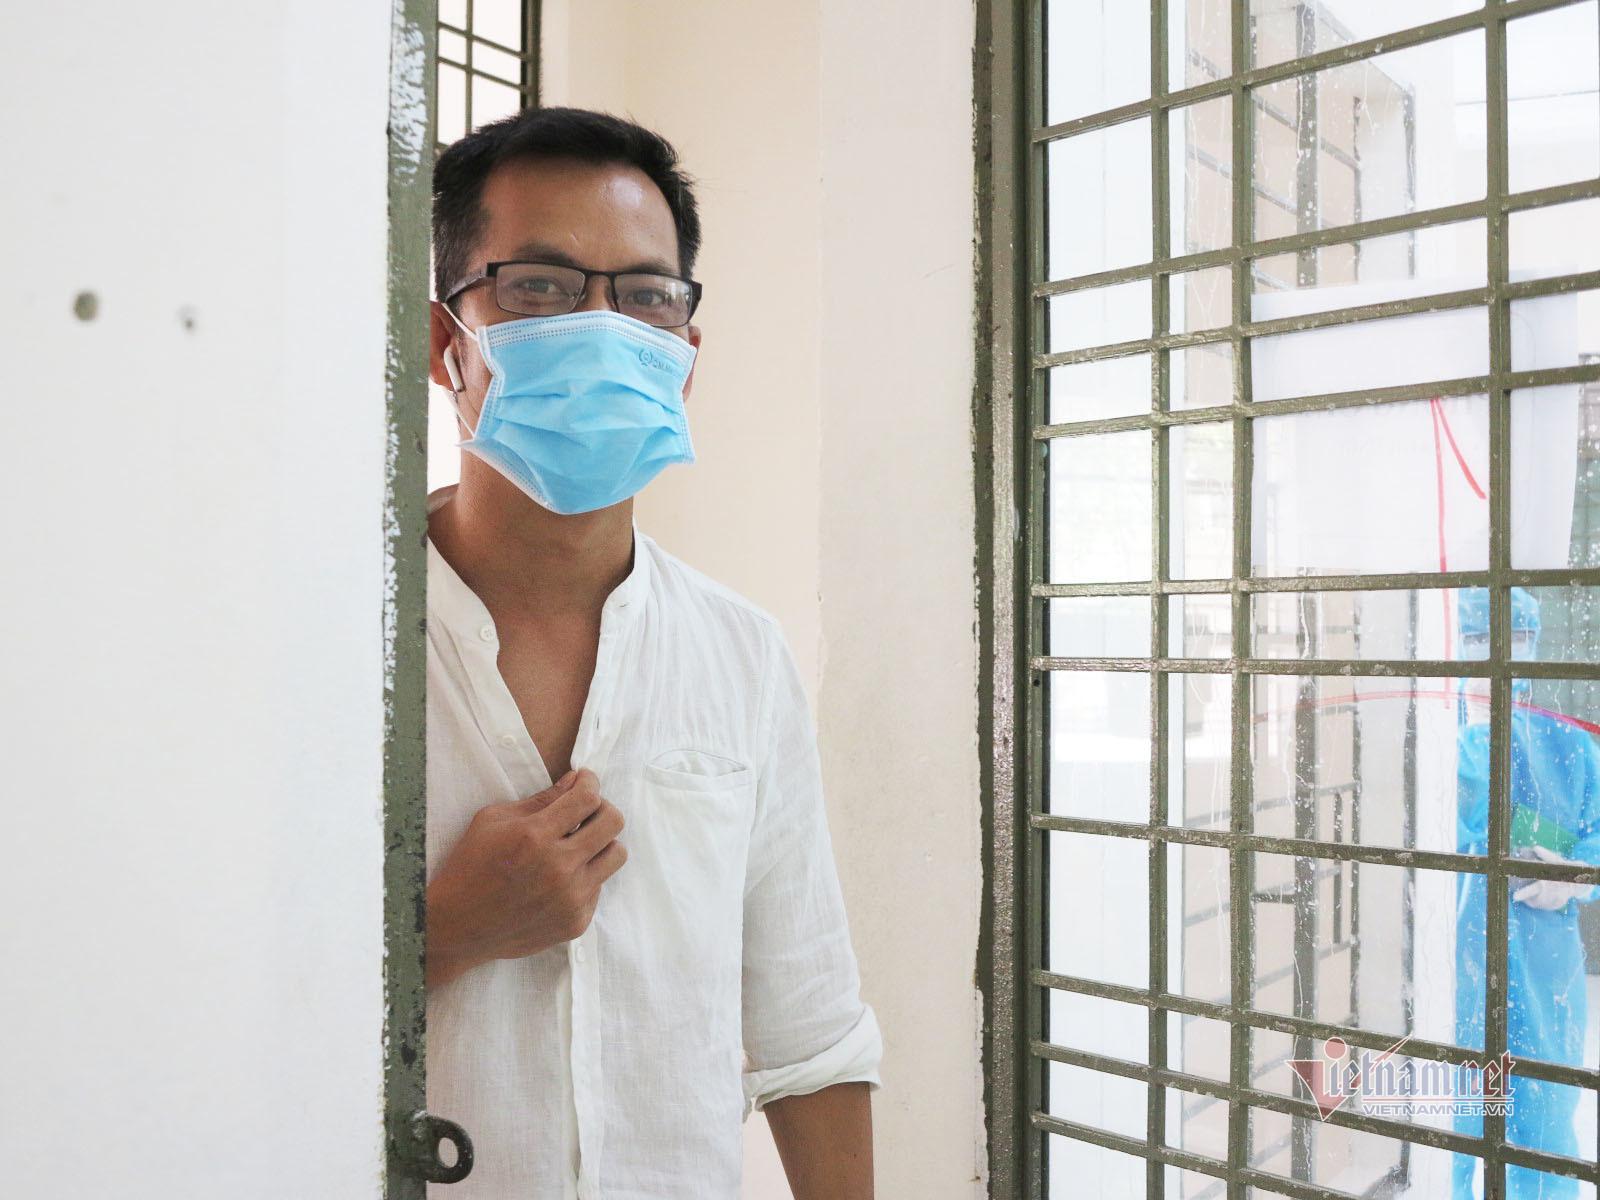 TP.HCM triển khai chăm sóc, theo dõi sức khỏe cho F0 tại nhà